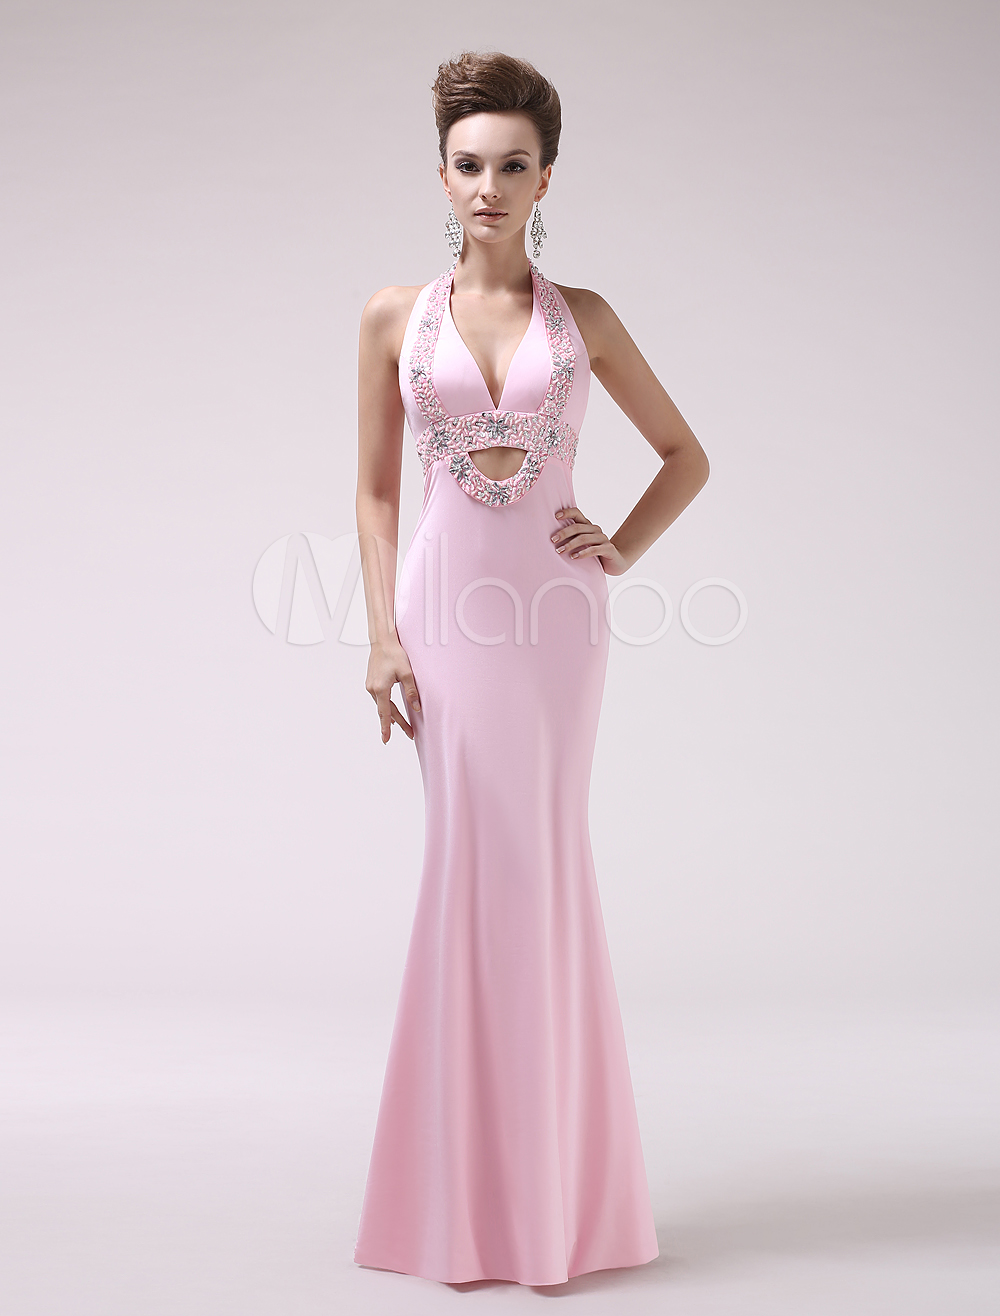 Pink Sequin Halter Mermaid Elastic Woven Satin Evening Dress Milanoo (Wedding Evening Dresses) photo